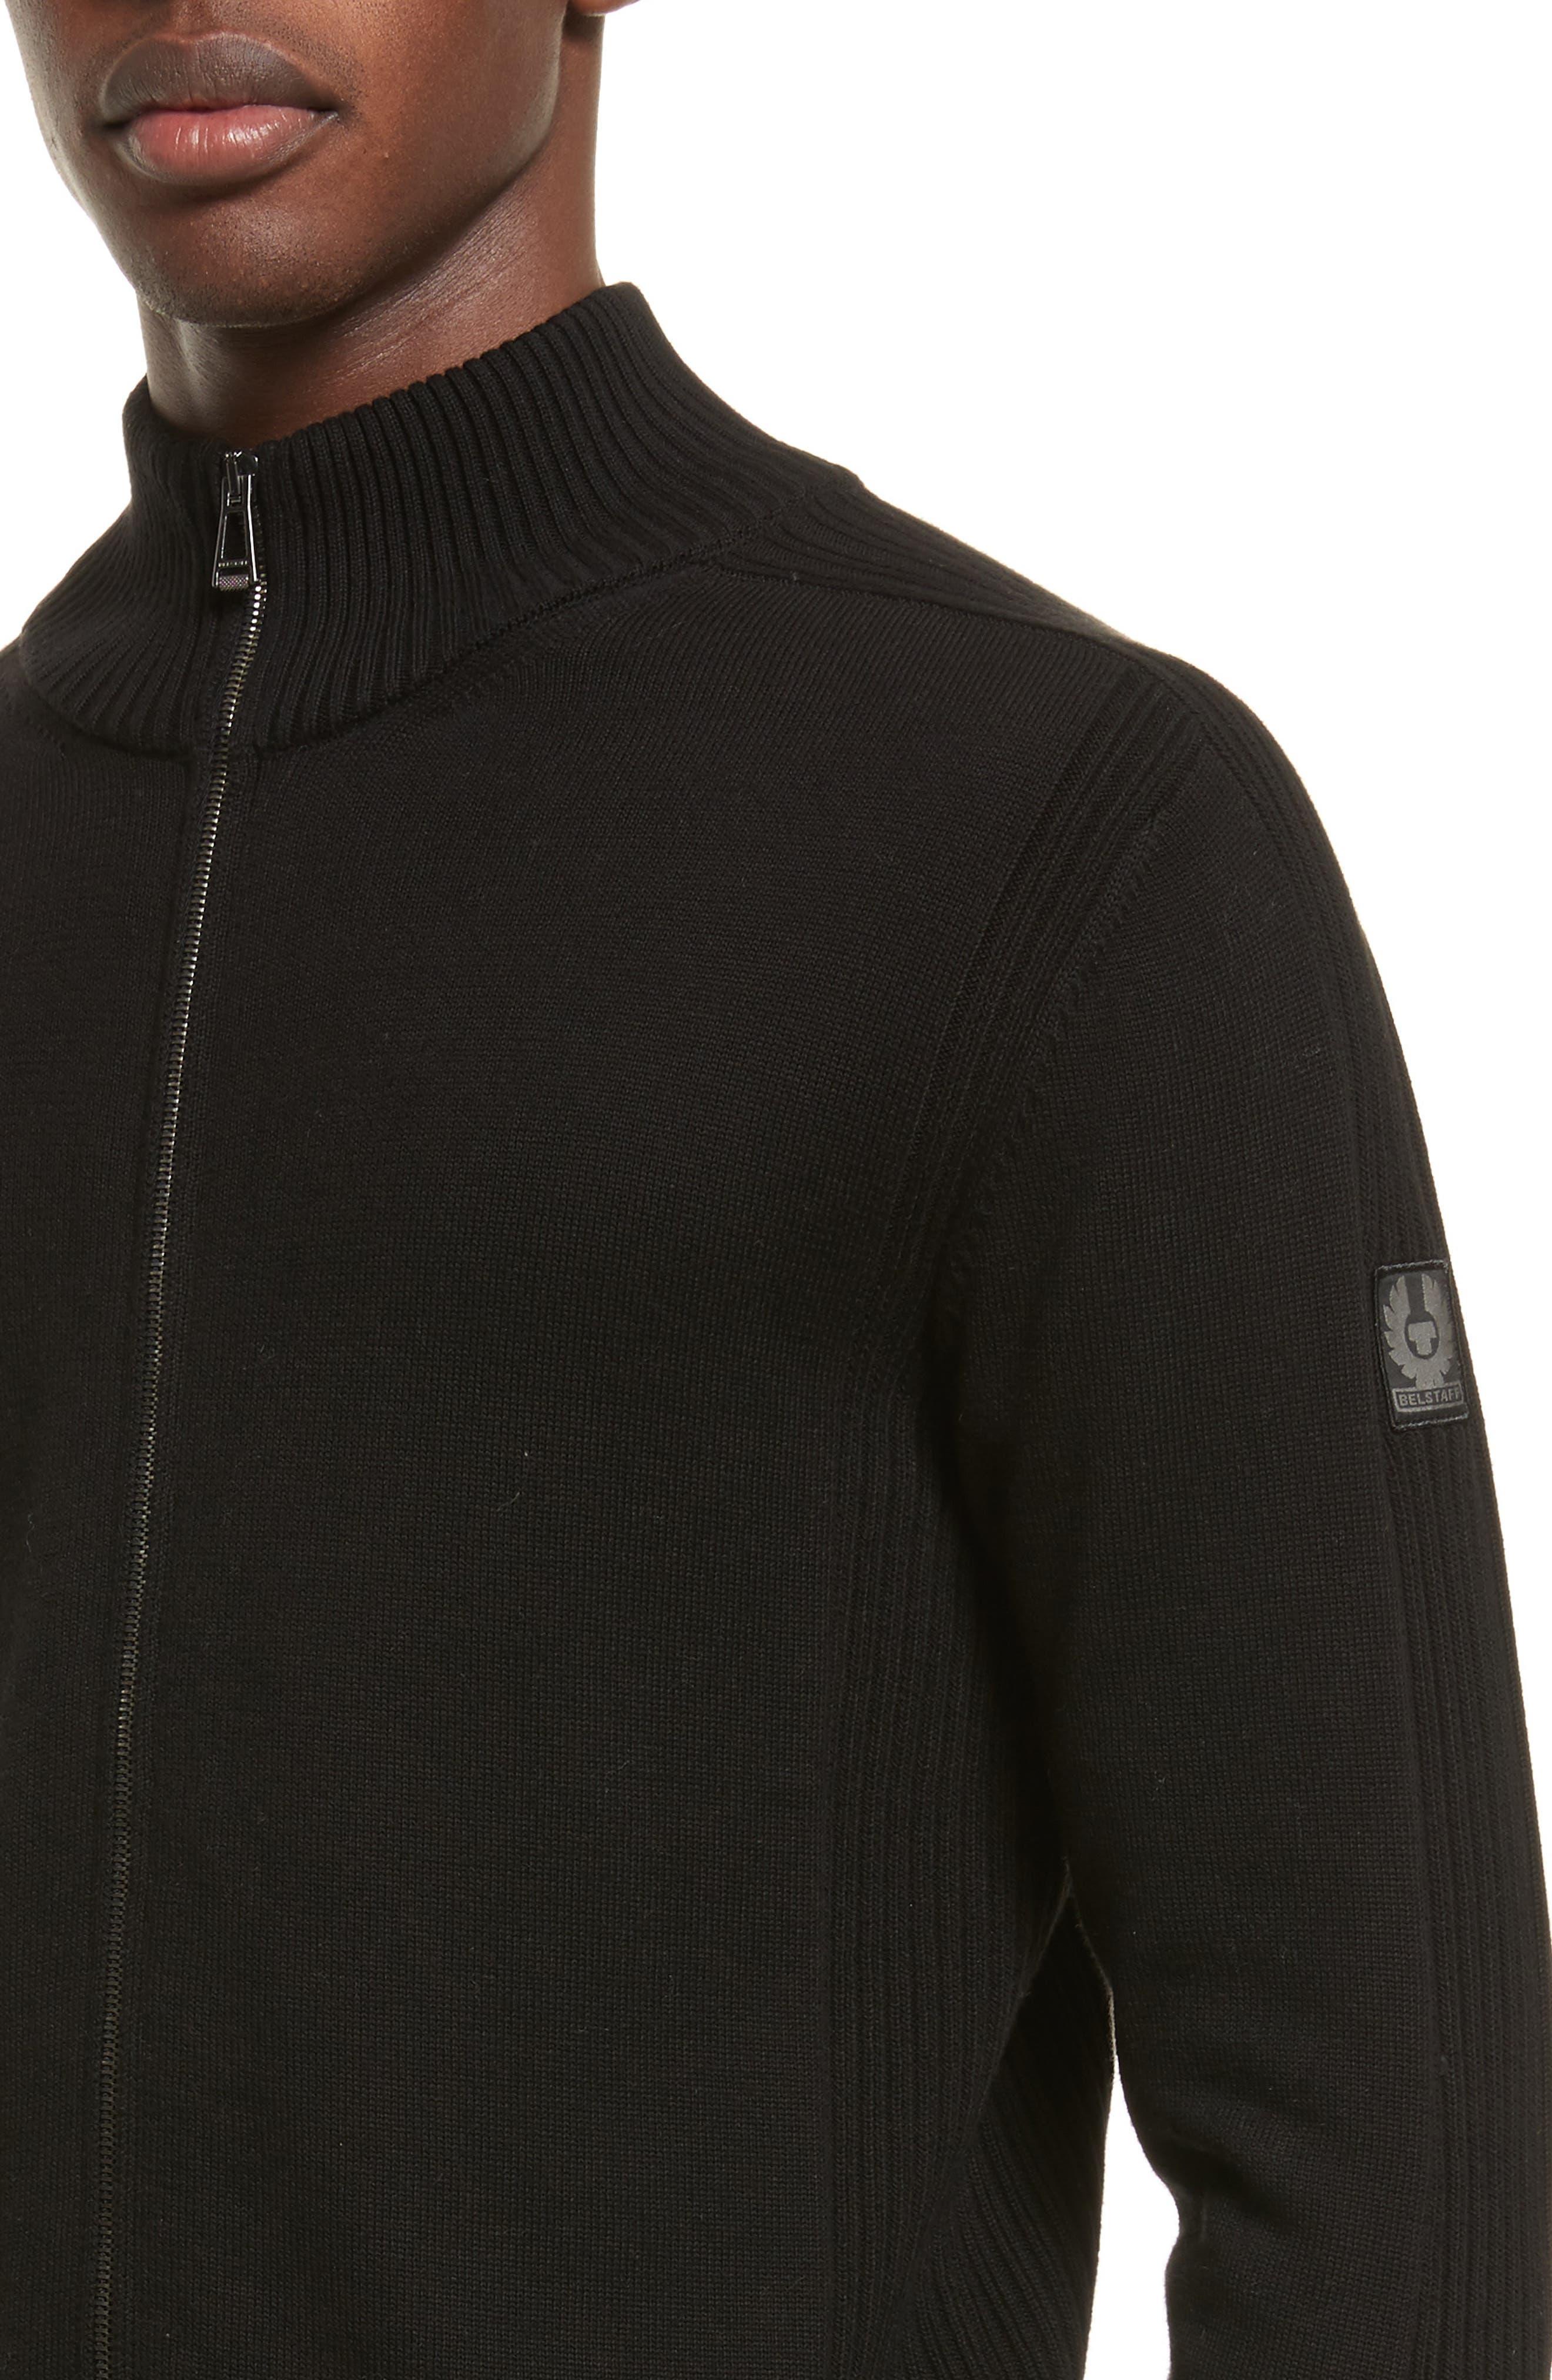 Allerford Knit Cotton Jacket,                             Alternate thumbnail 4, color,                             001